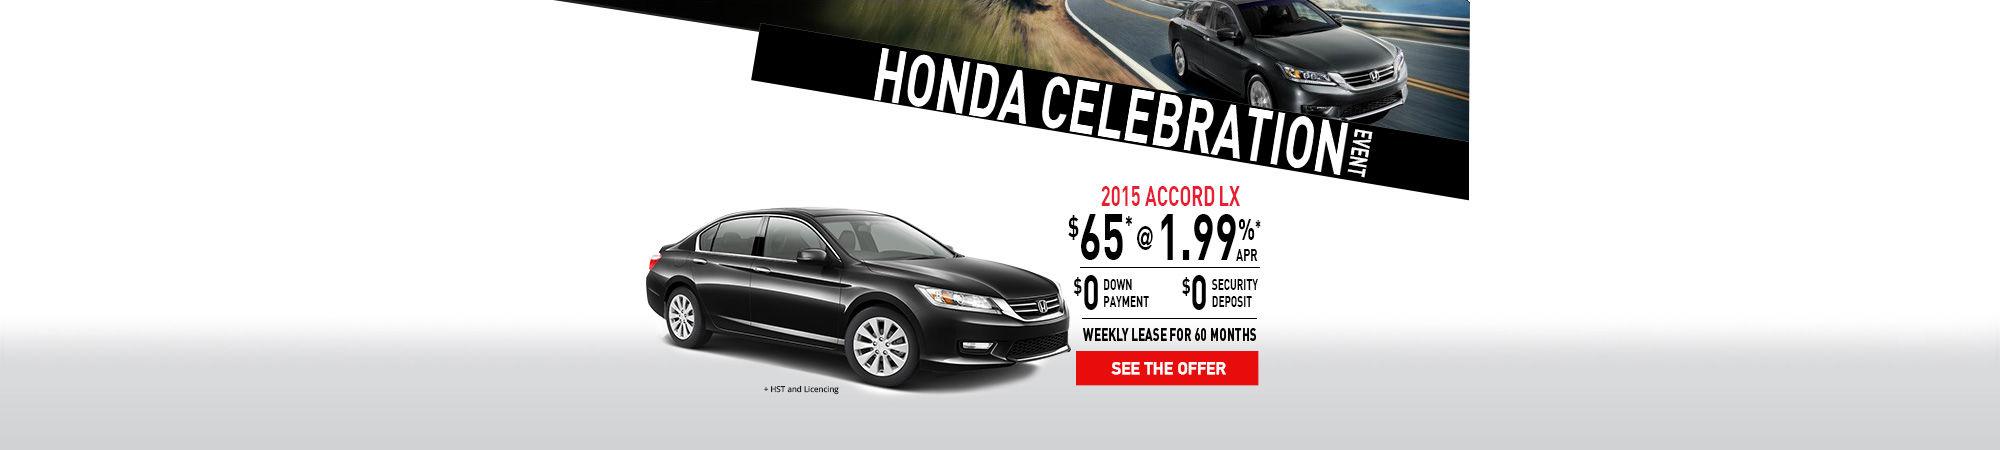 Honda Celebration -2015 Honda ACCORD-February